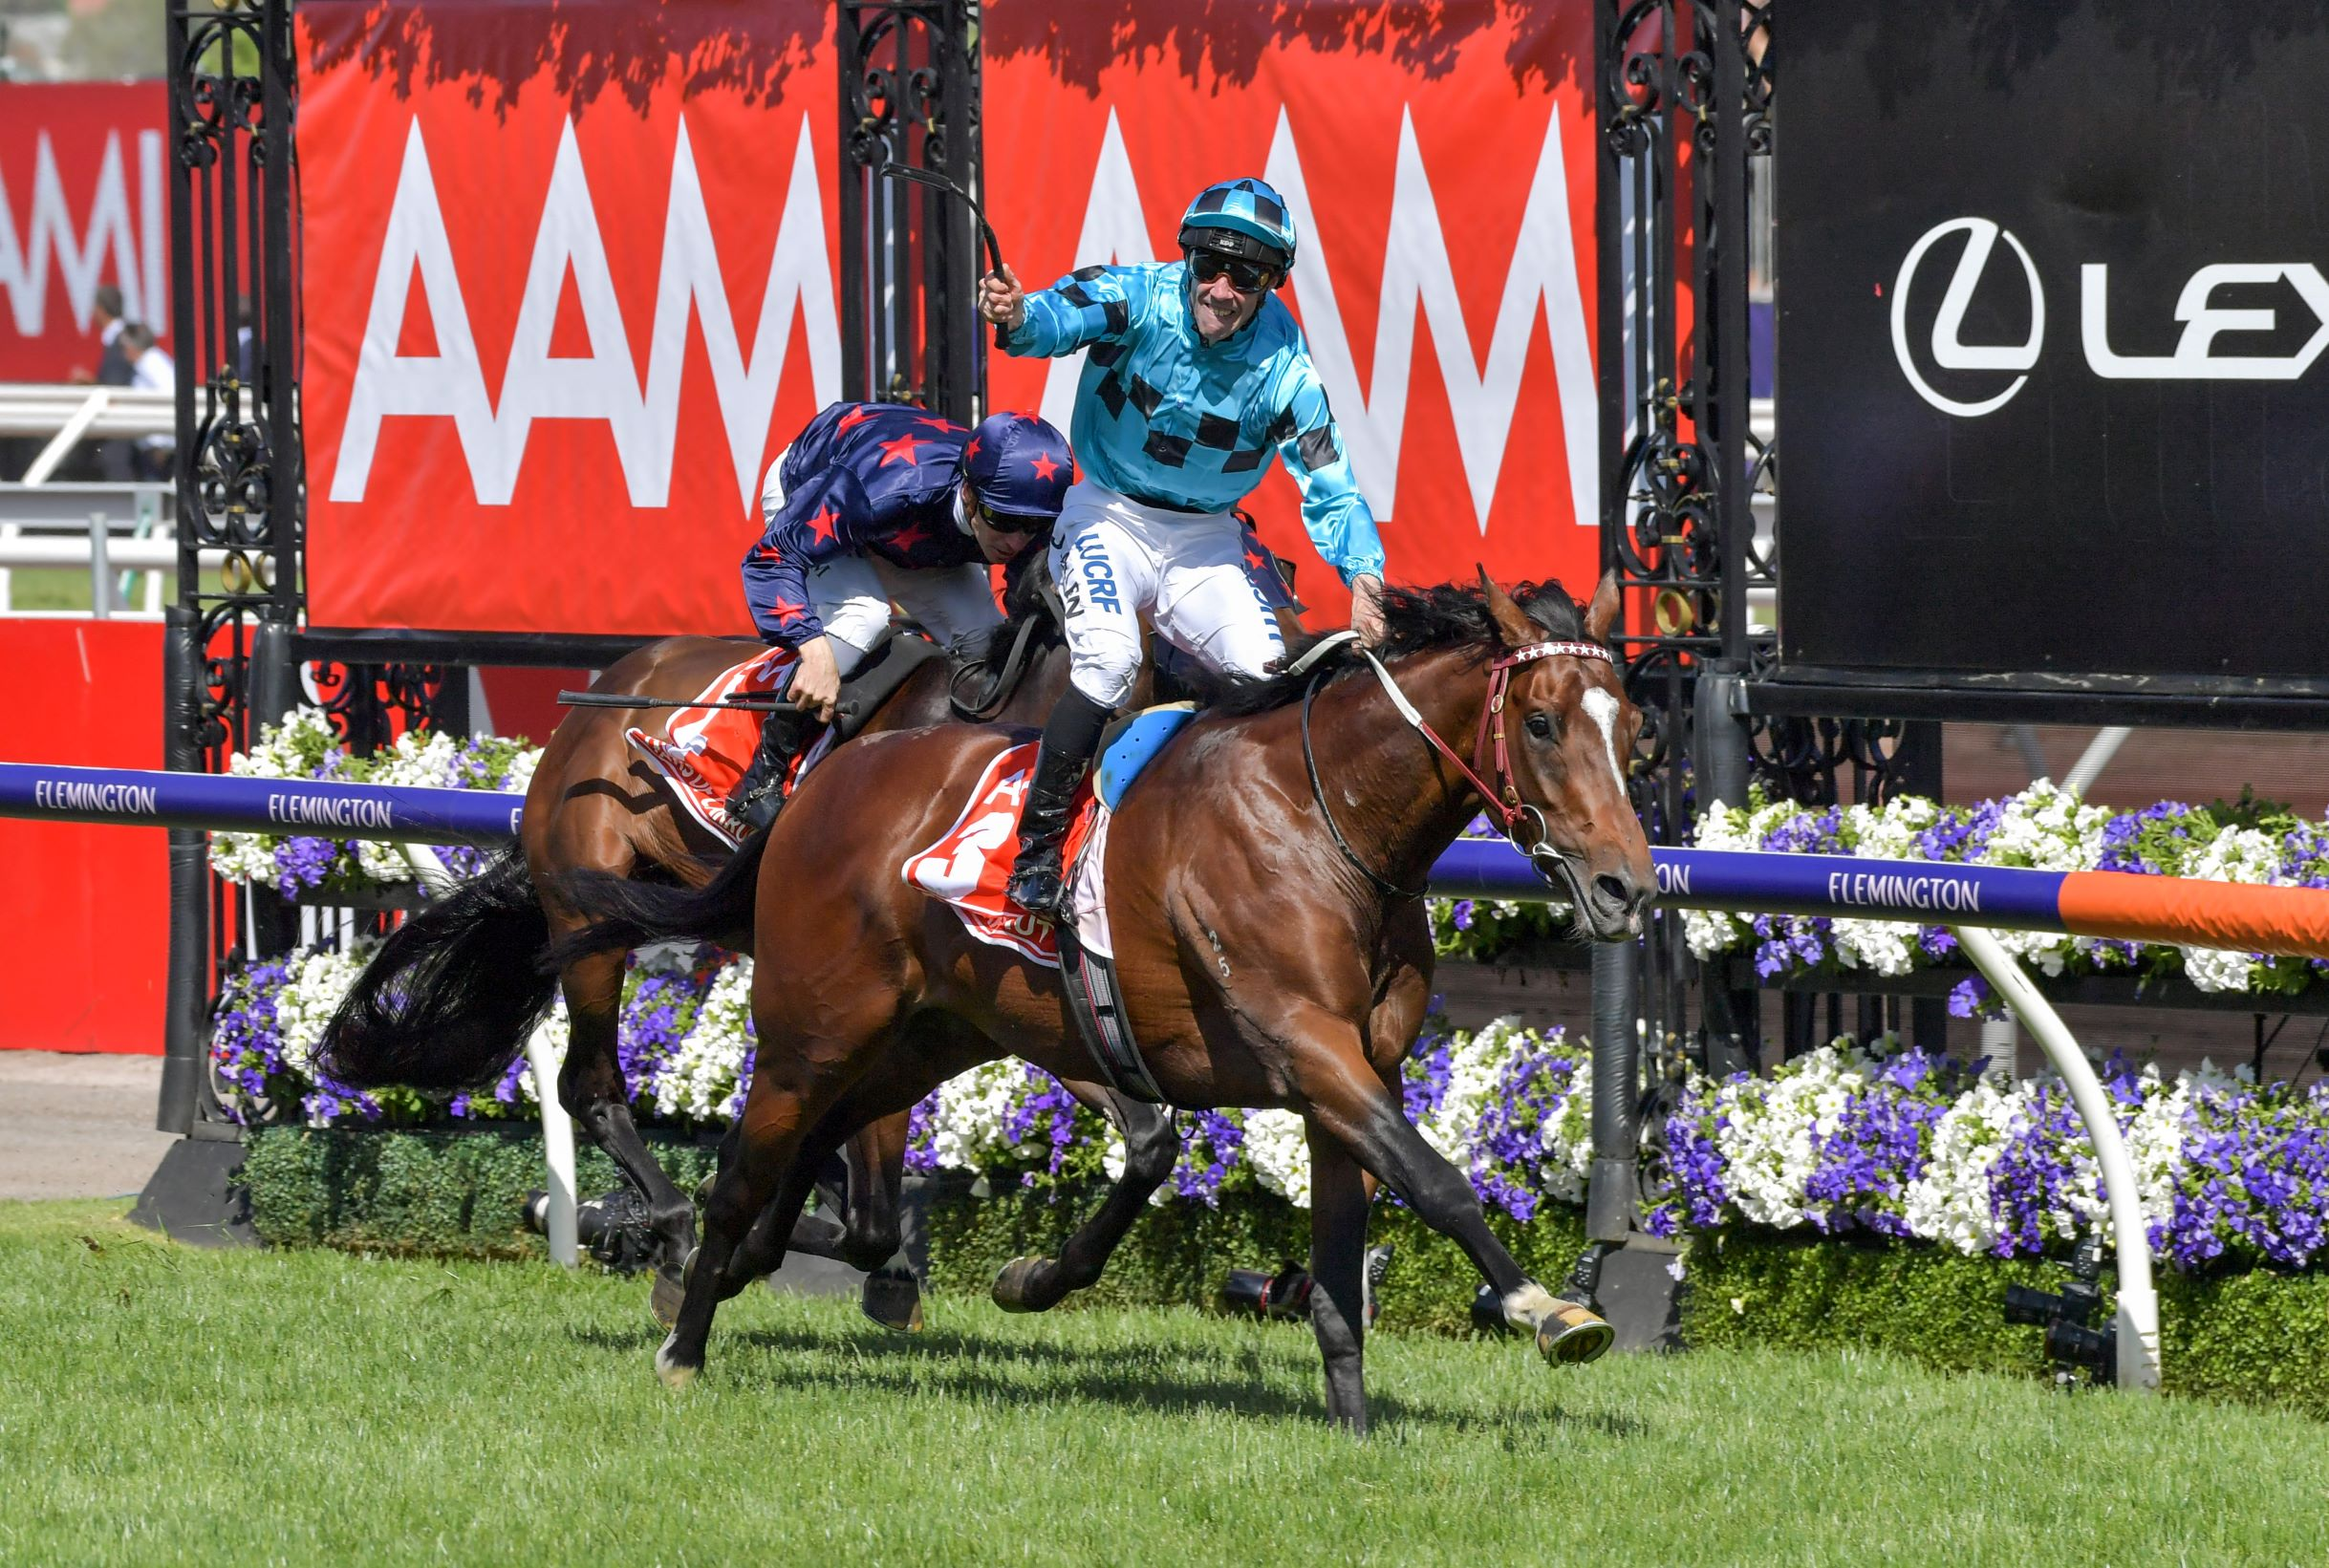 Jockey John Allen celebrates as Extra Brut crosses the line winning the Victoria Derby